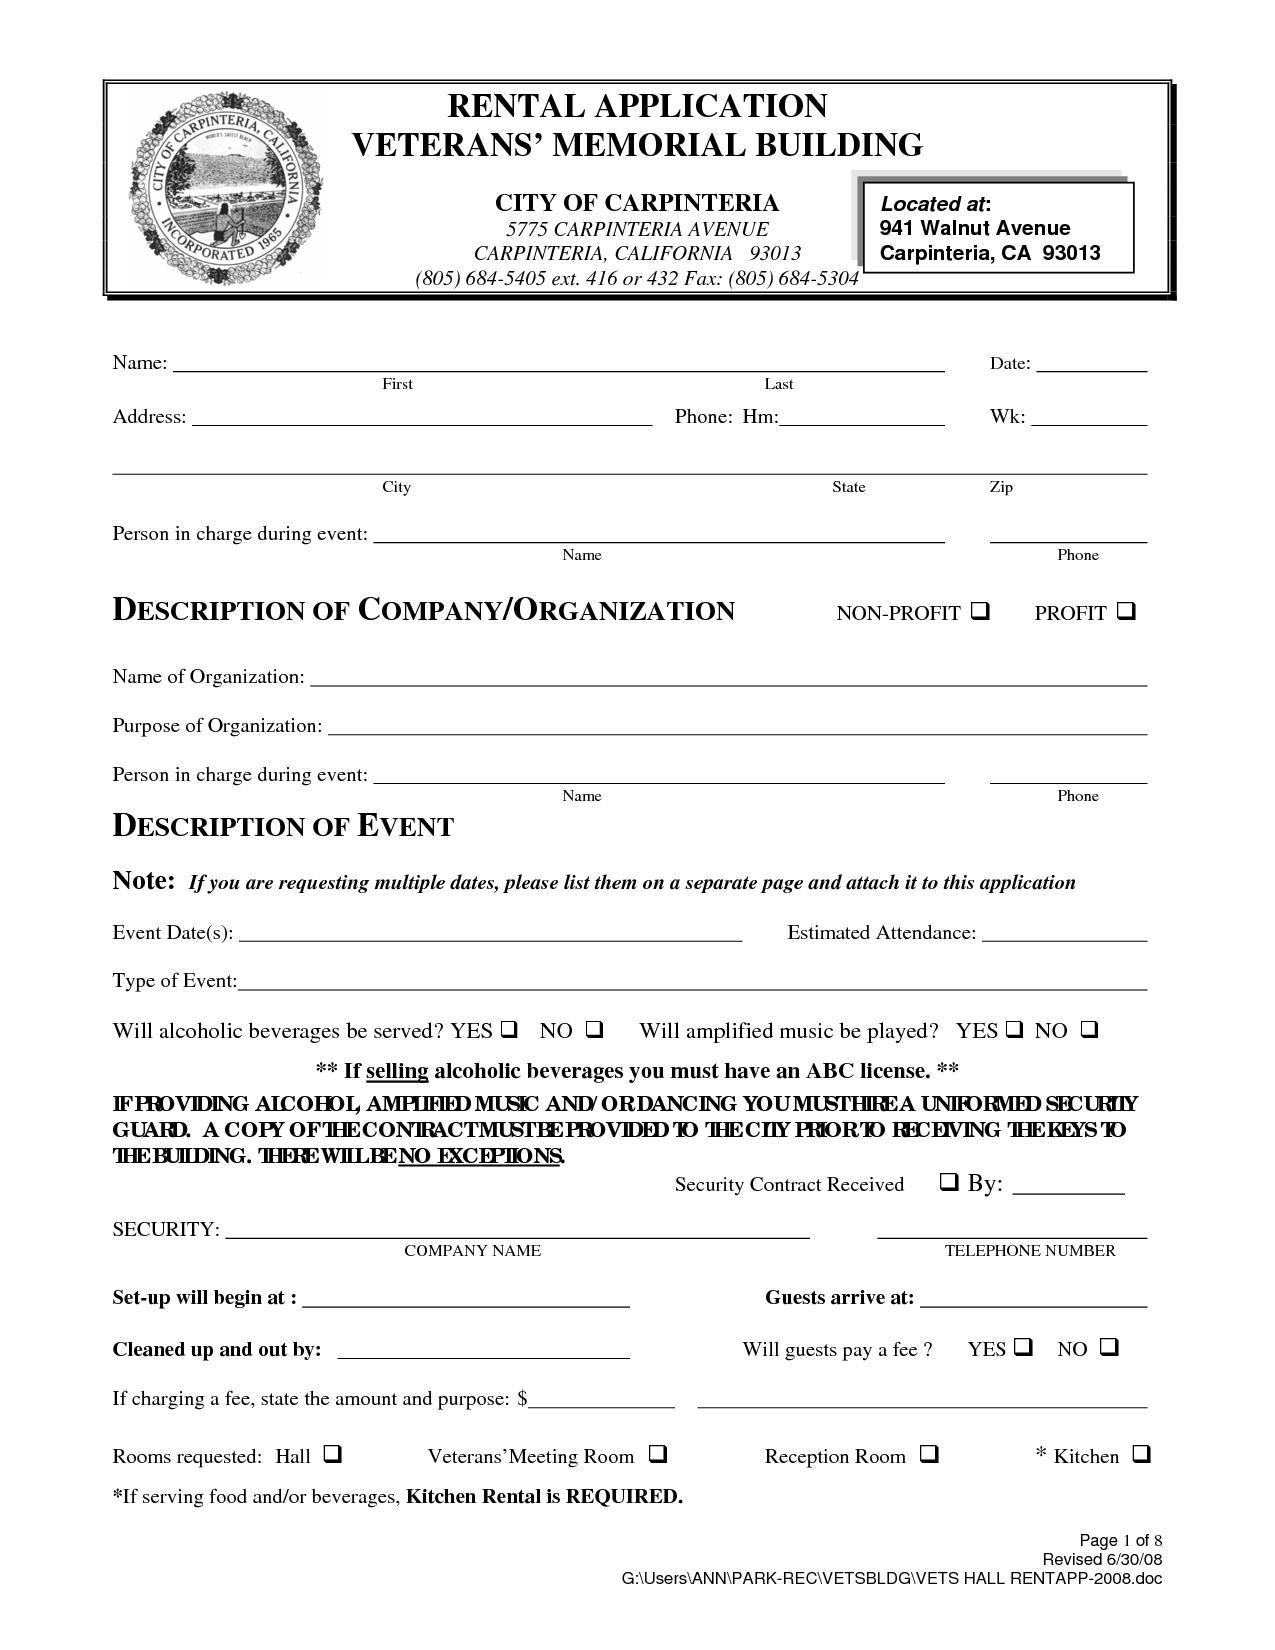 Free California Rental Agreement | gtld world congress